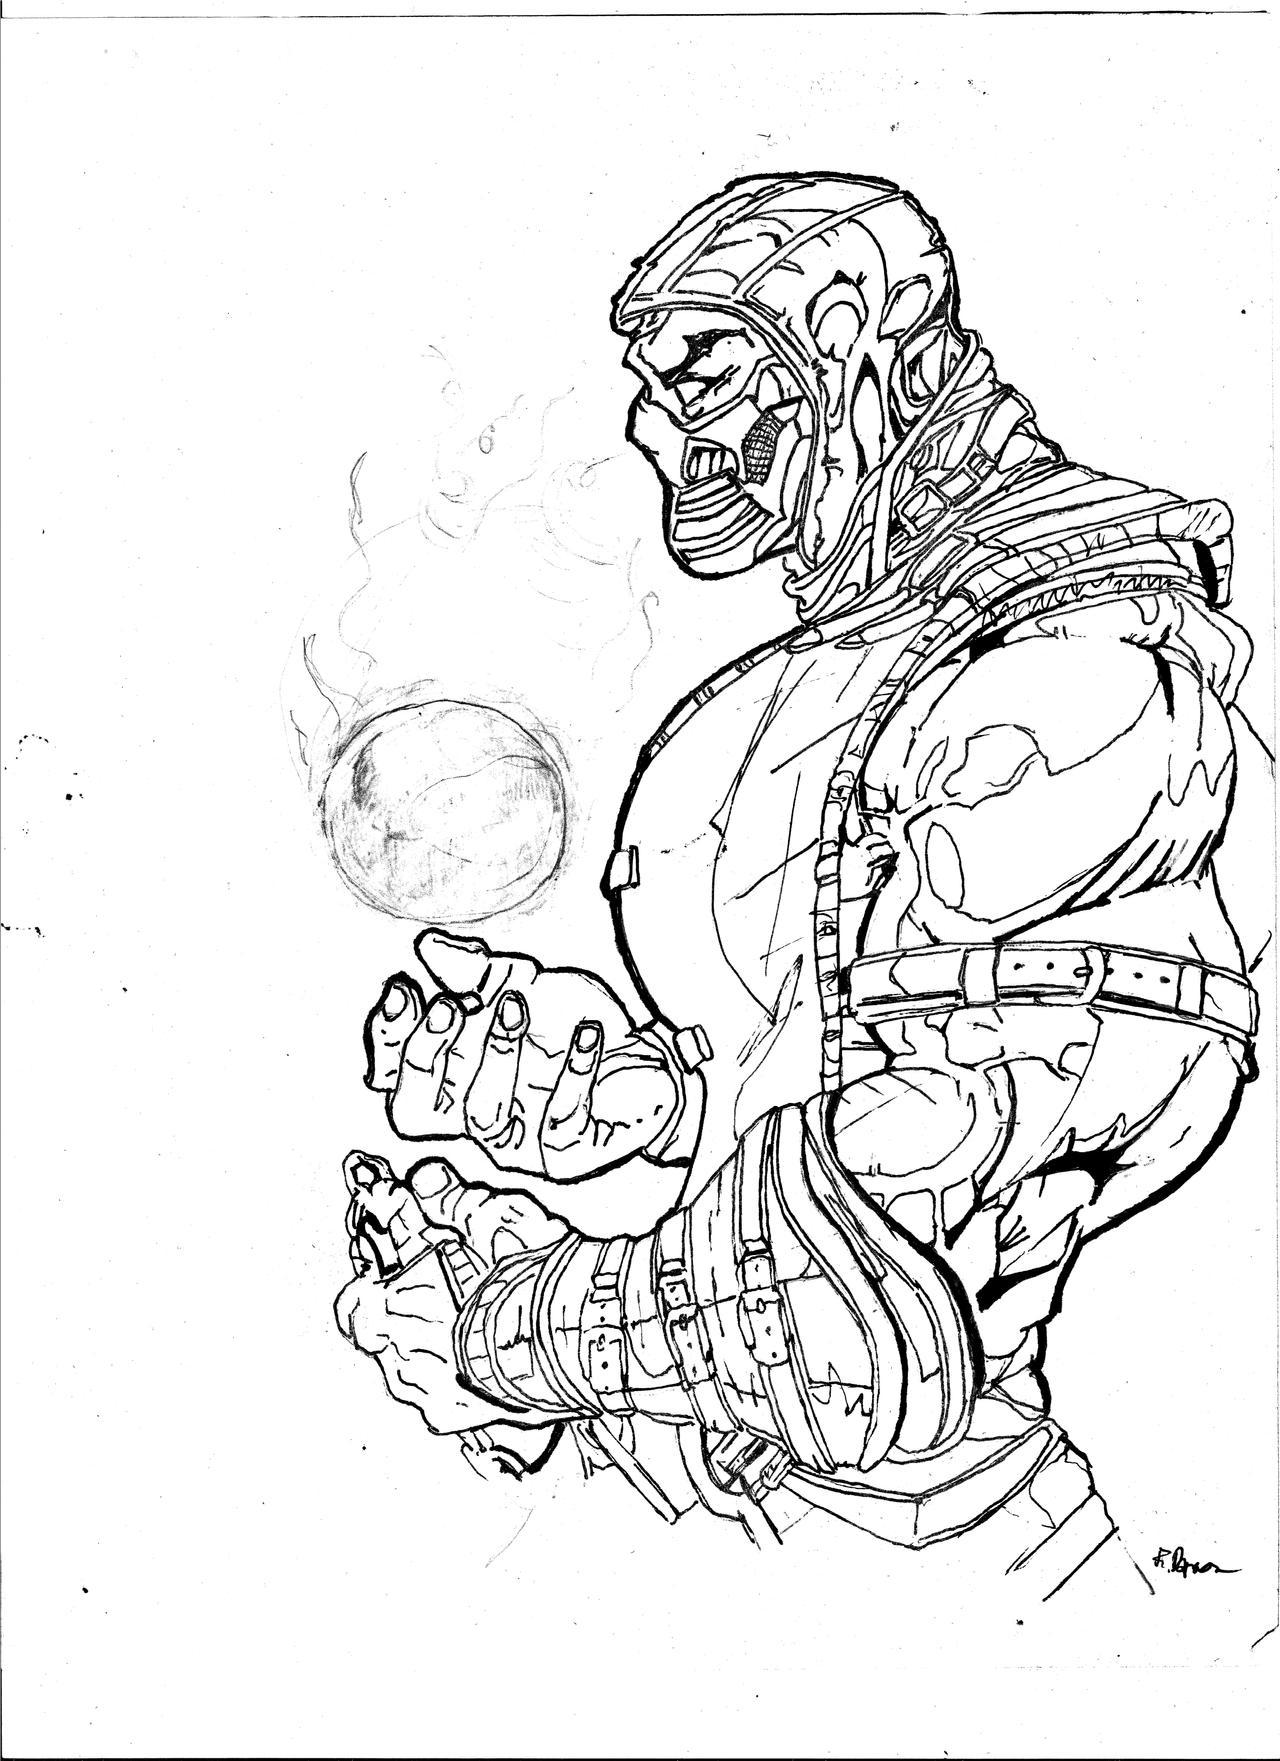 Scorpion Mortal Kombat Drawing By Bed562 On Deviantart